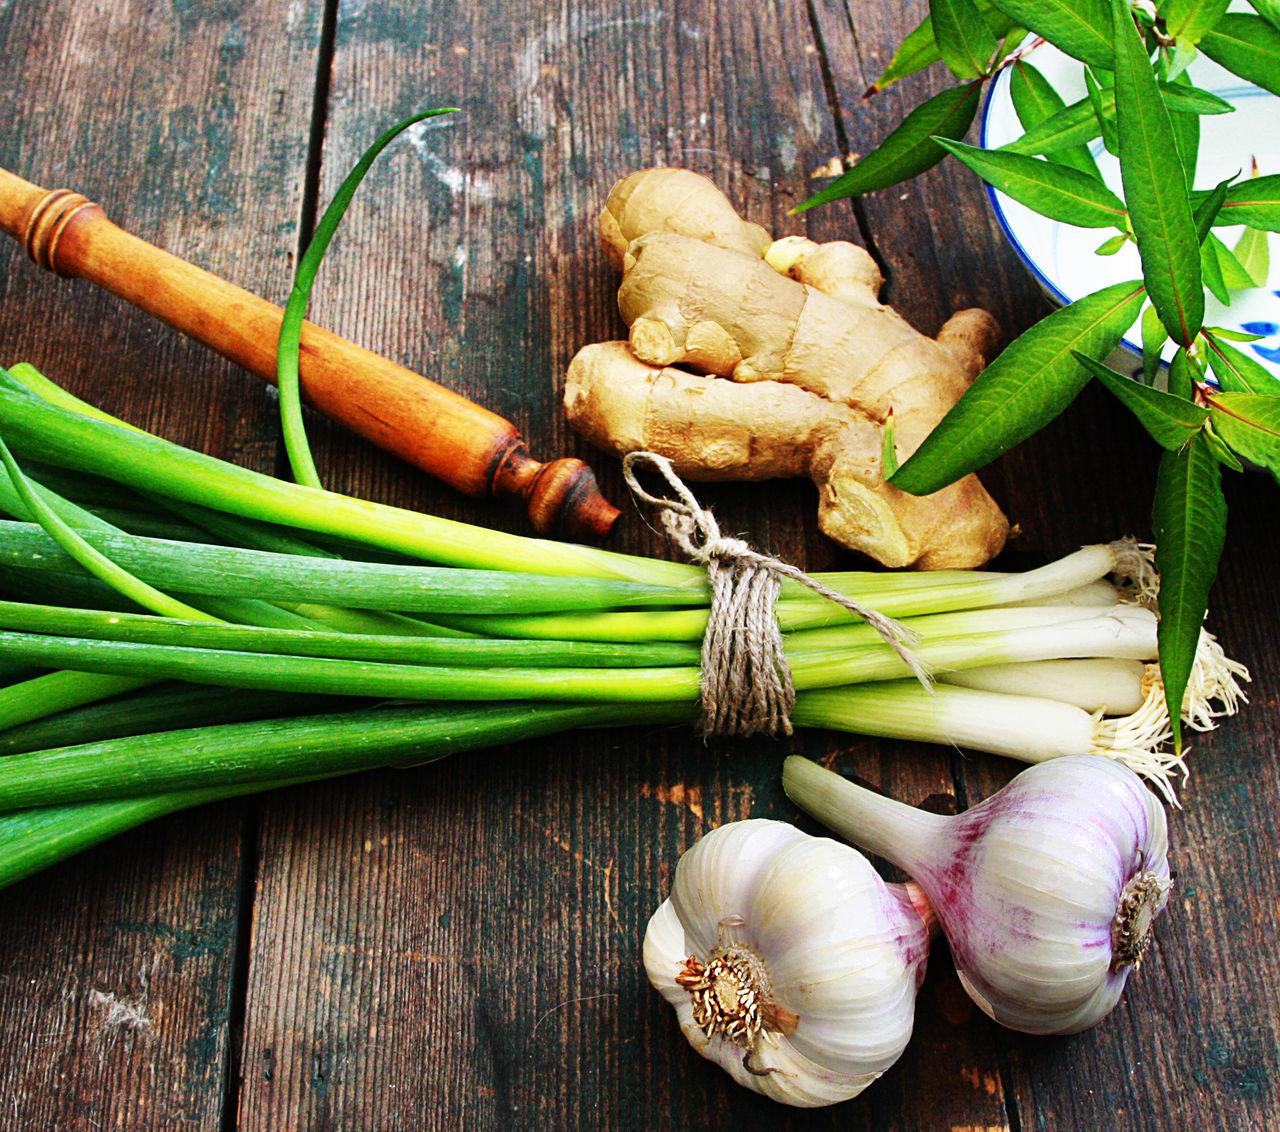 Aisa Food Freshness Garlic Girl Leek Thai Basil Vegetable Vintage